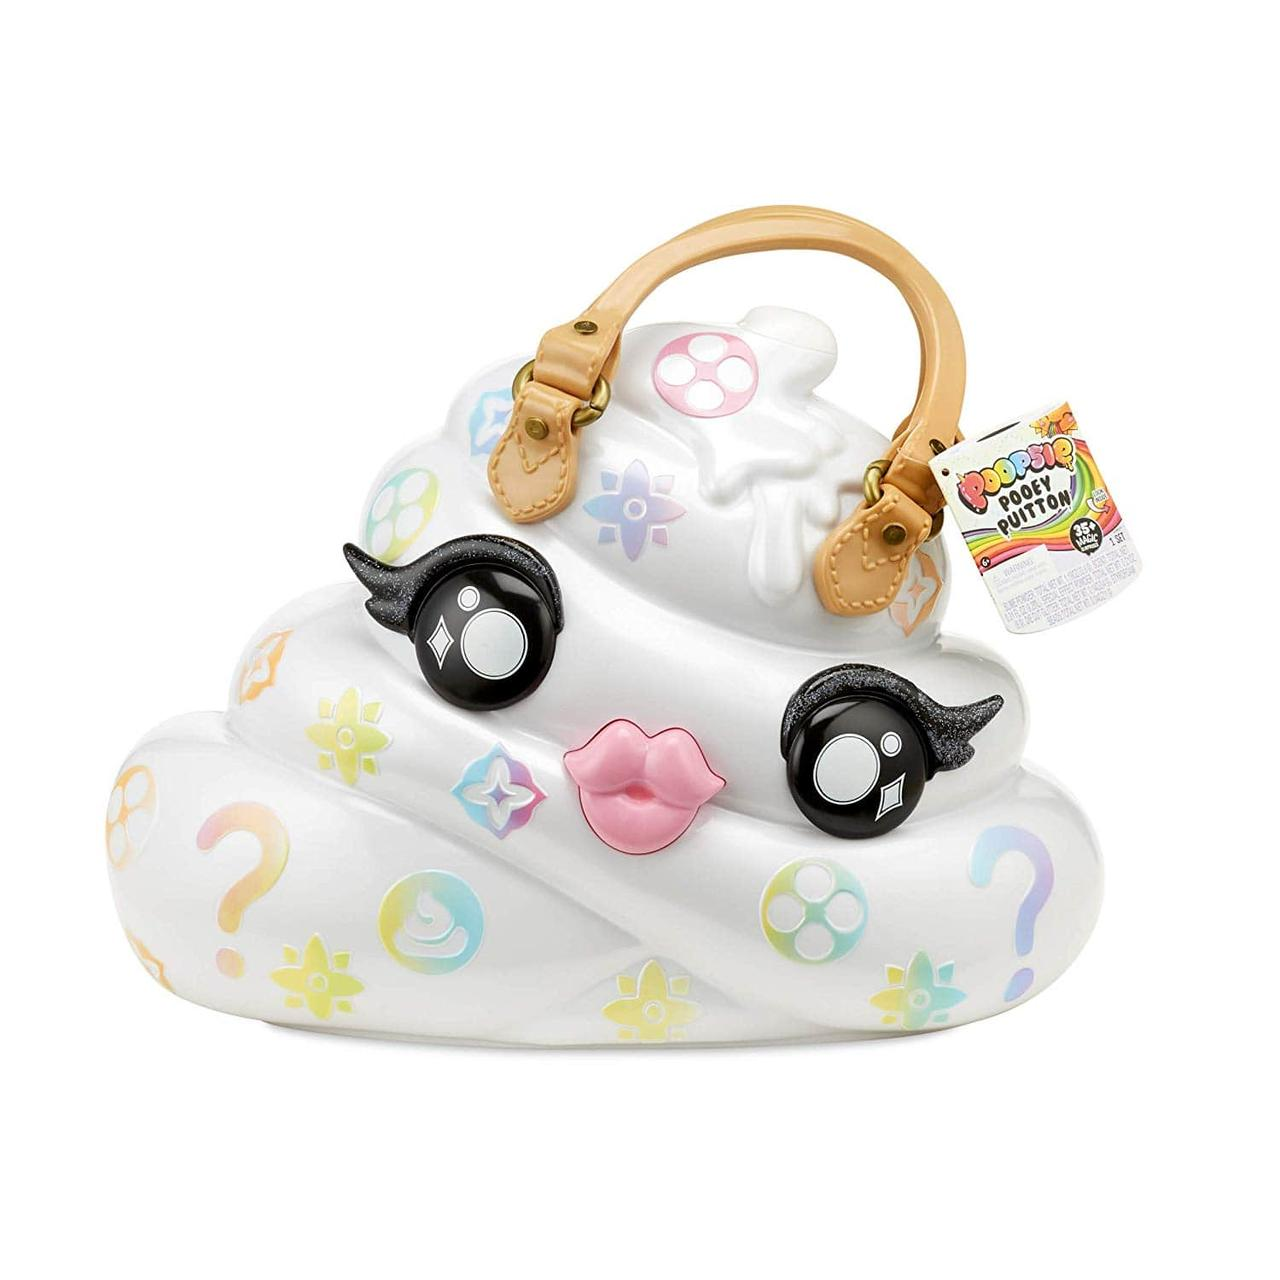 Сумка Poopsie Slime Surprise Pooey Puitton сумка с лизунами игрушка сюрприз для девочек